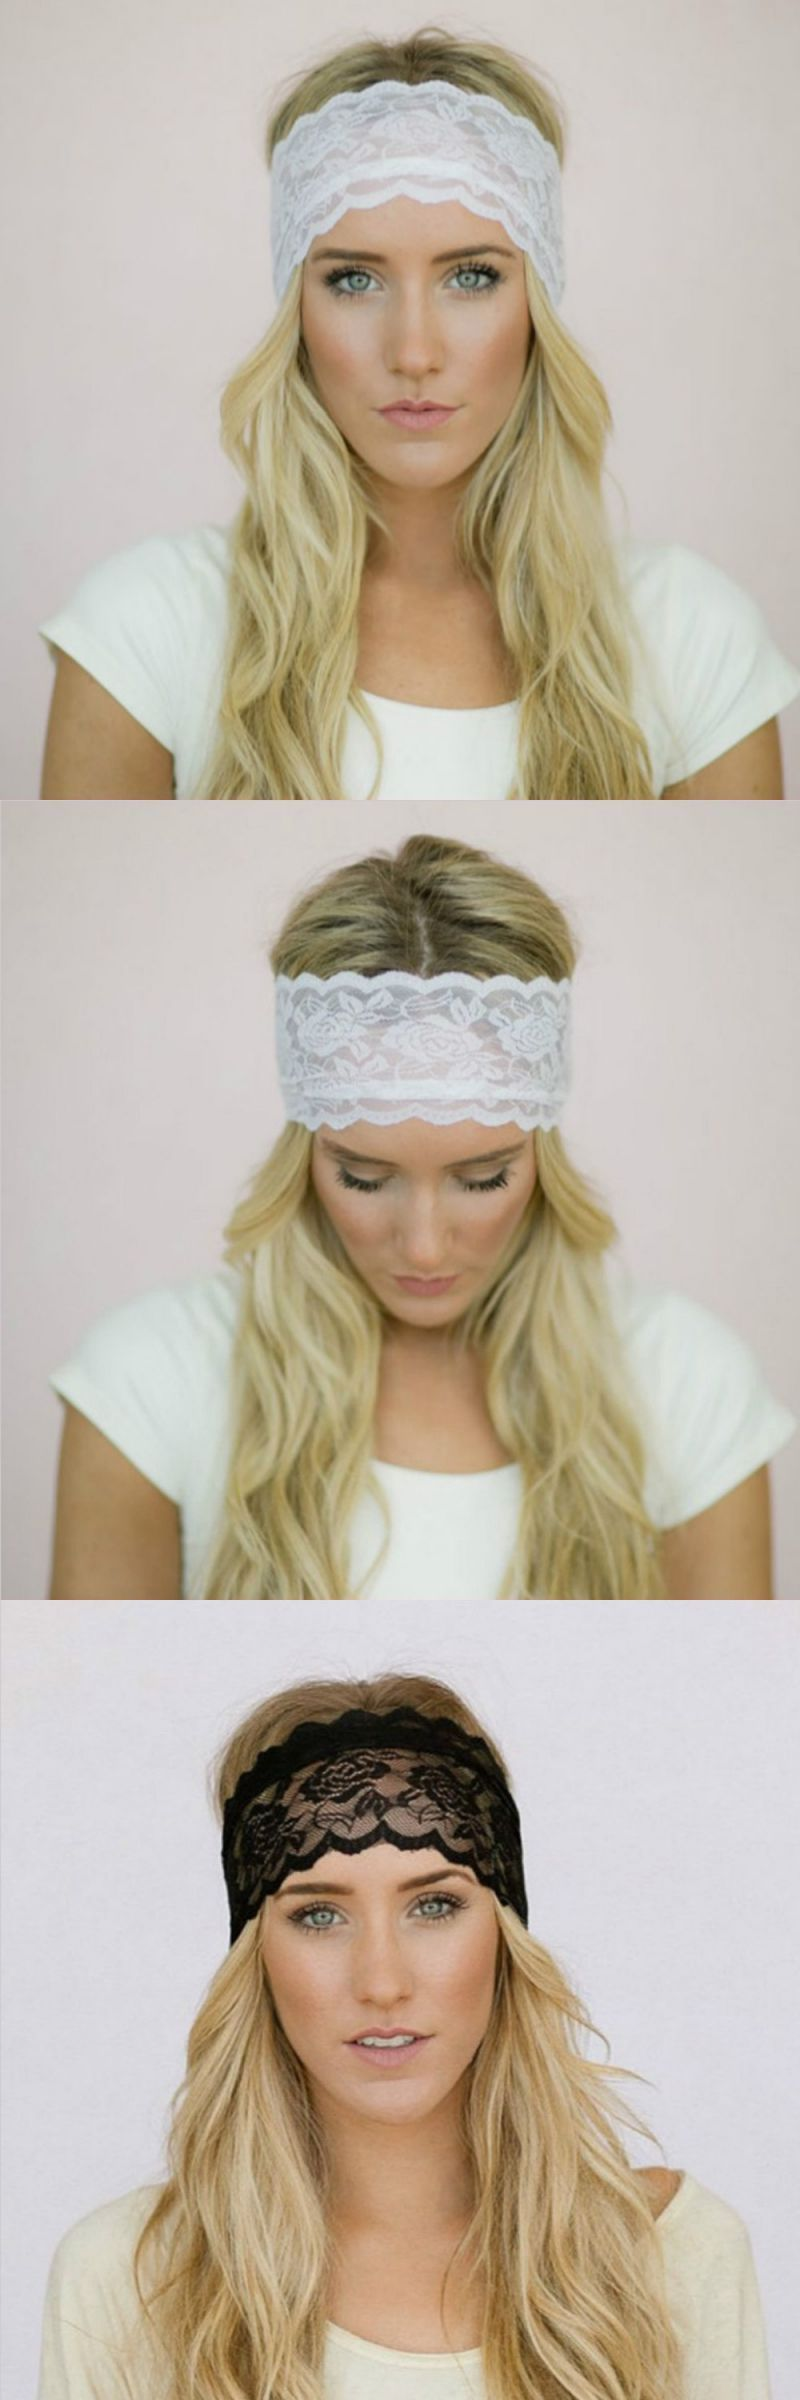 Girl Women Lace Headband Retro Hair Band Wide Head wraps Hair Accessories